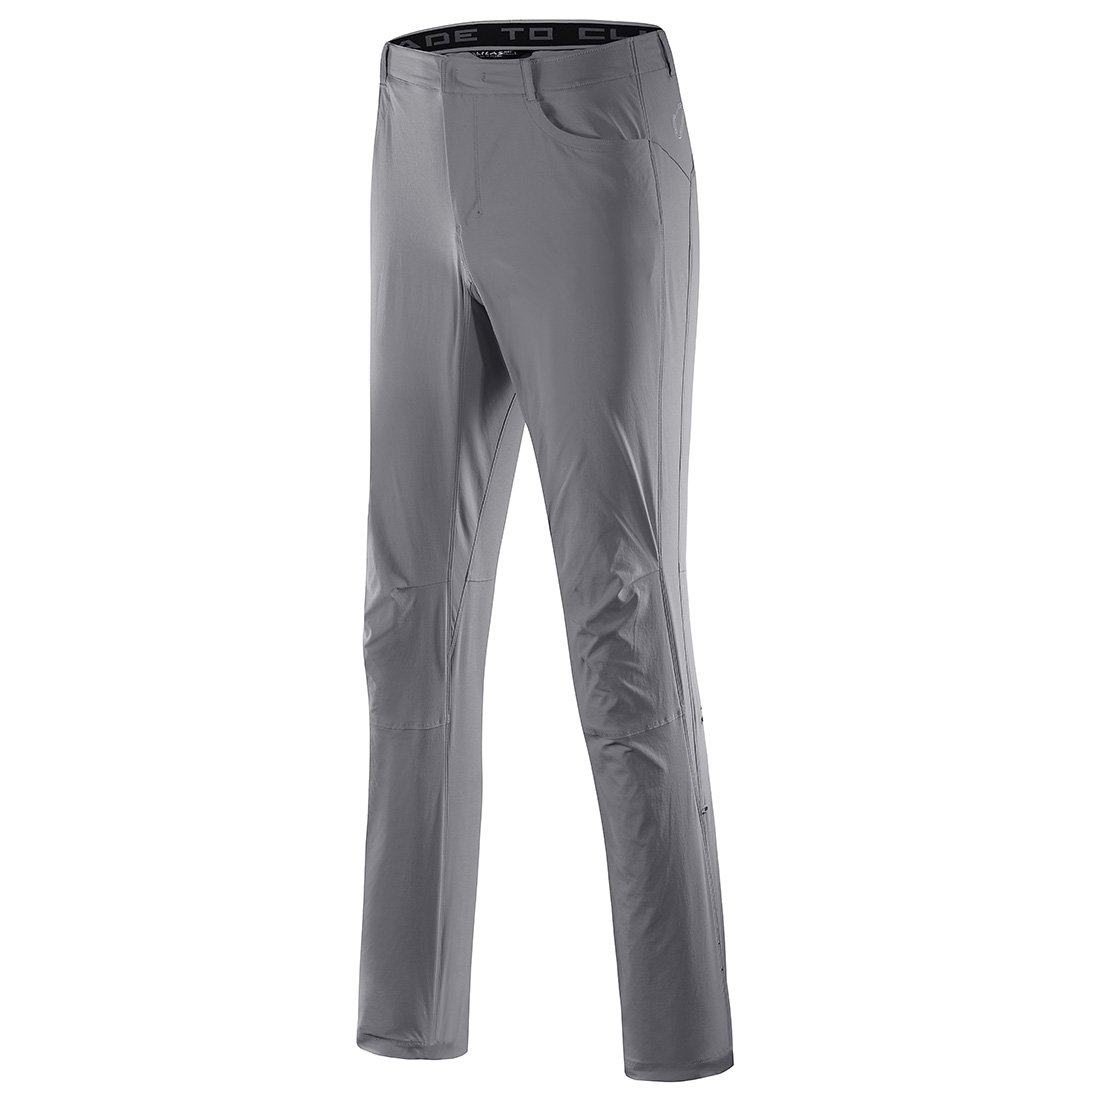 KAILAS Mens 9A Quick Dry Pants Lightweight Classic Rock Climbing Bouldering